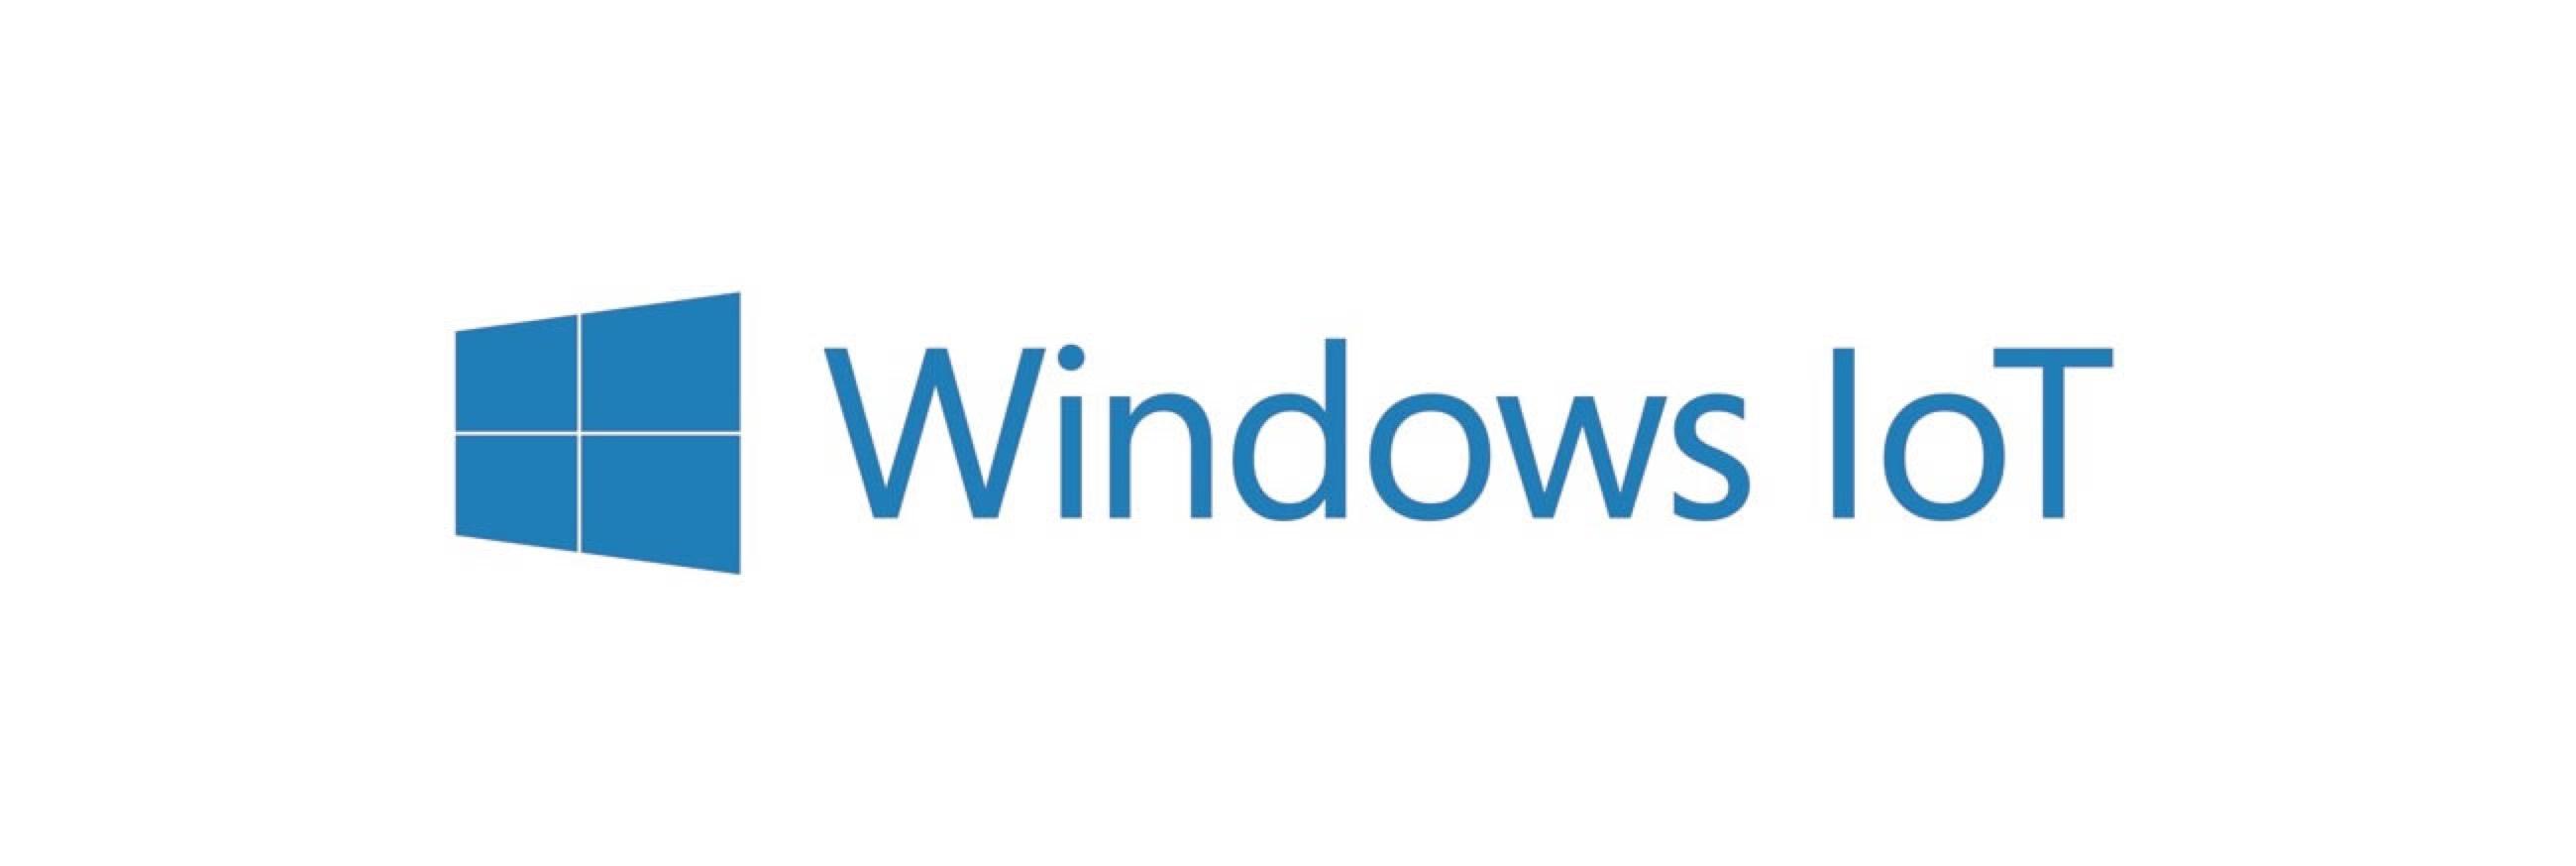 Windowsiot